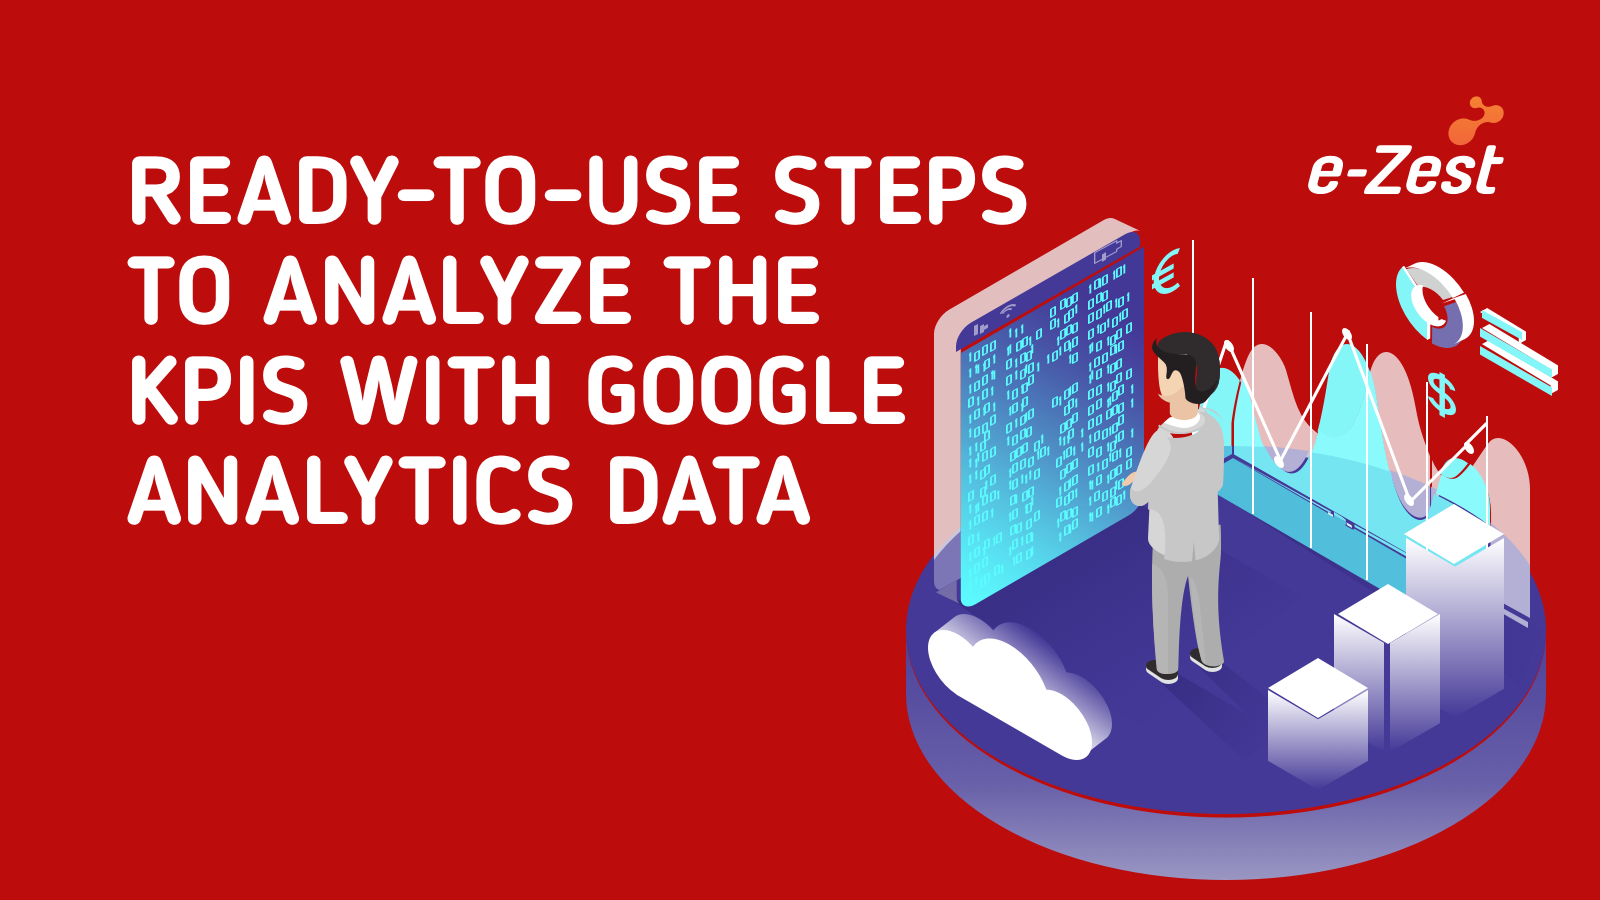 Ready-to-use steps to analyze the KPIs with Google Analytics data